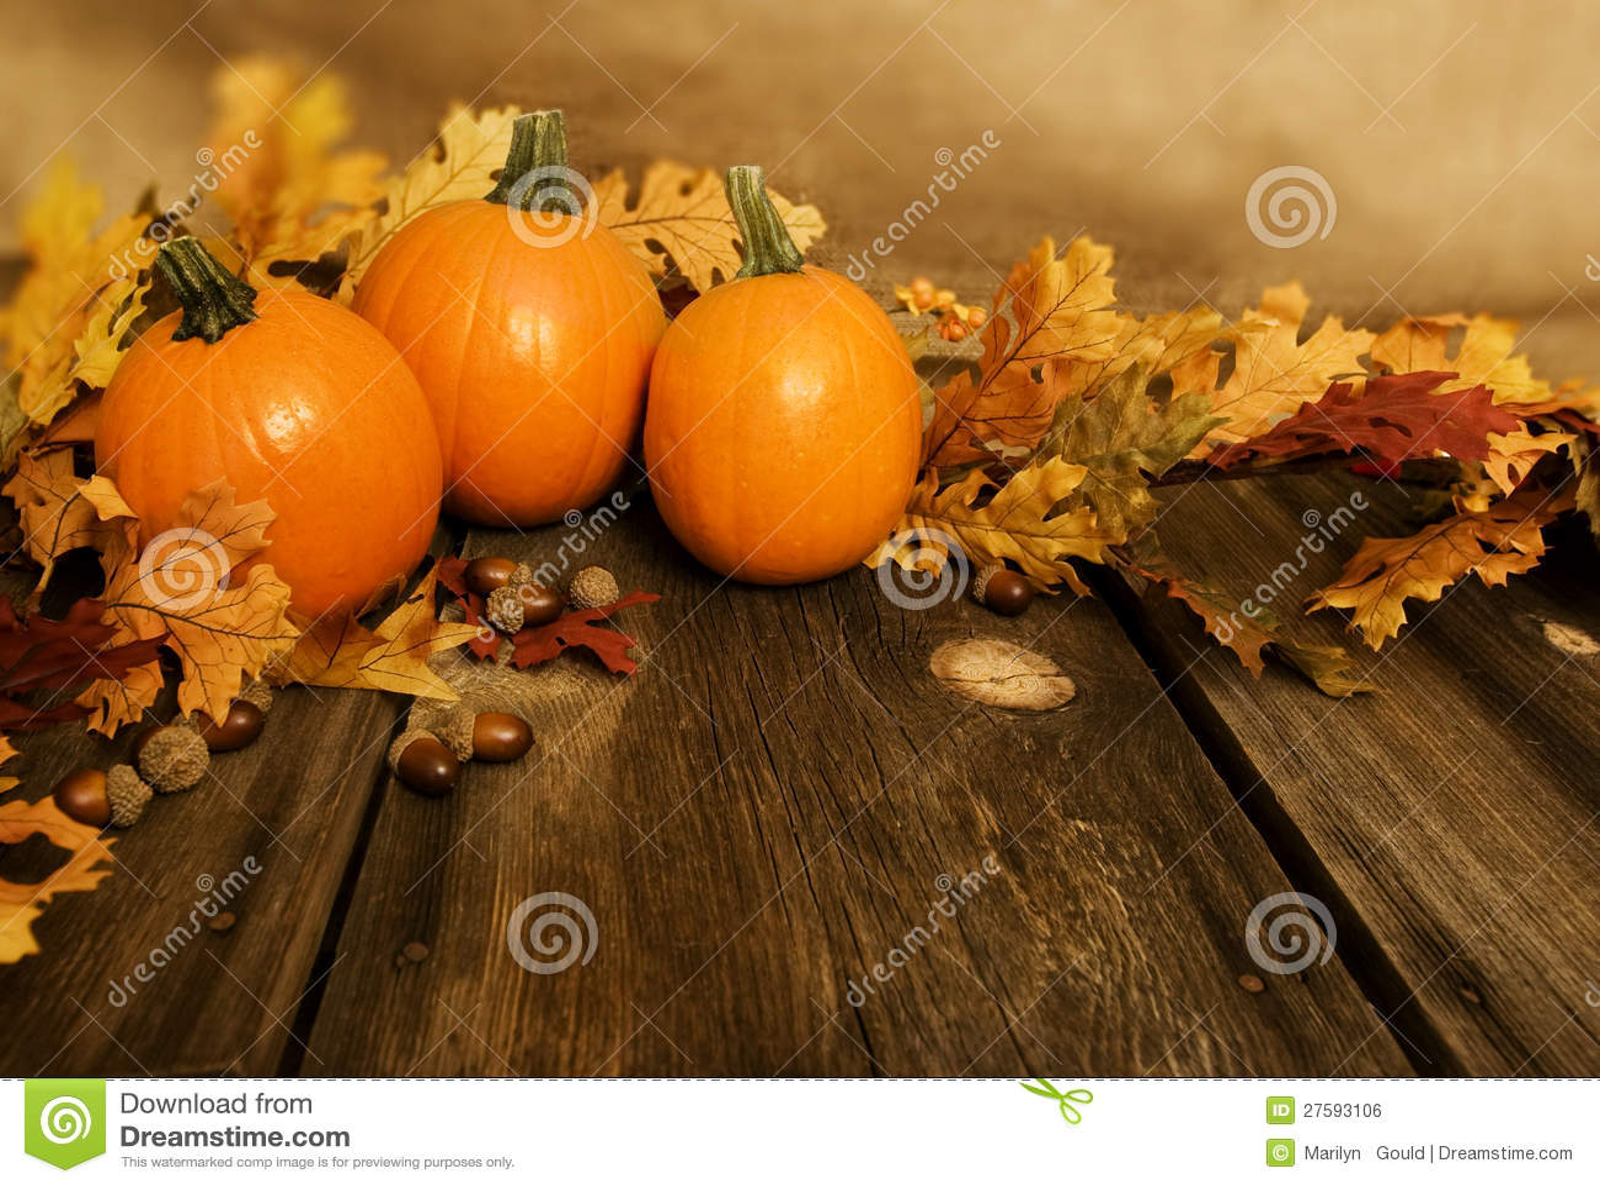 Pumpkins Fall Leaves